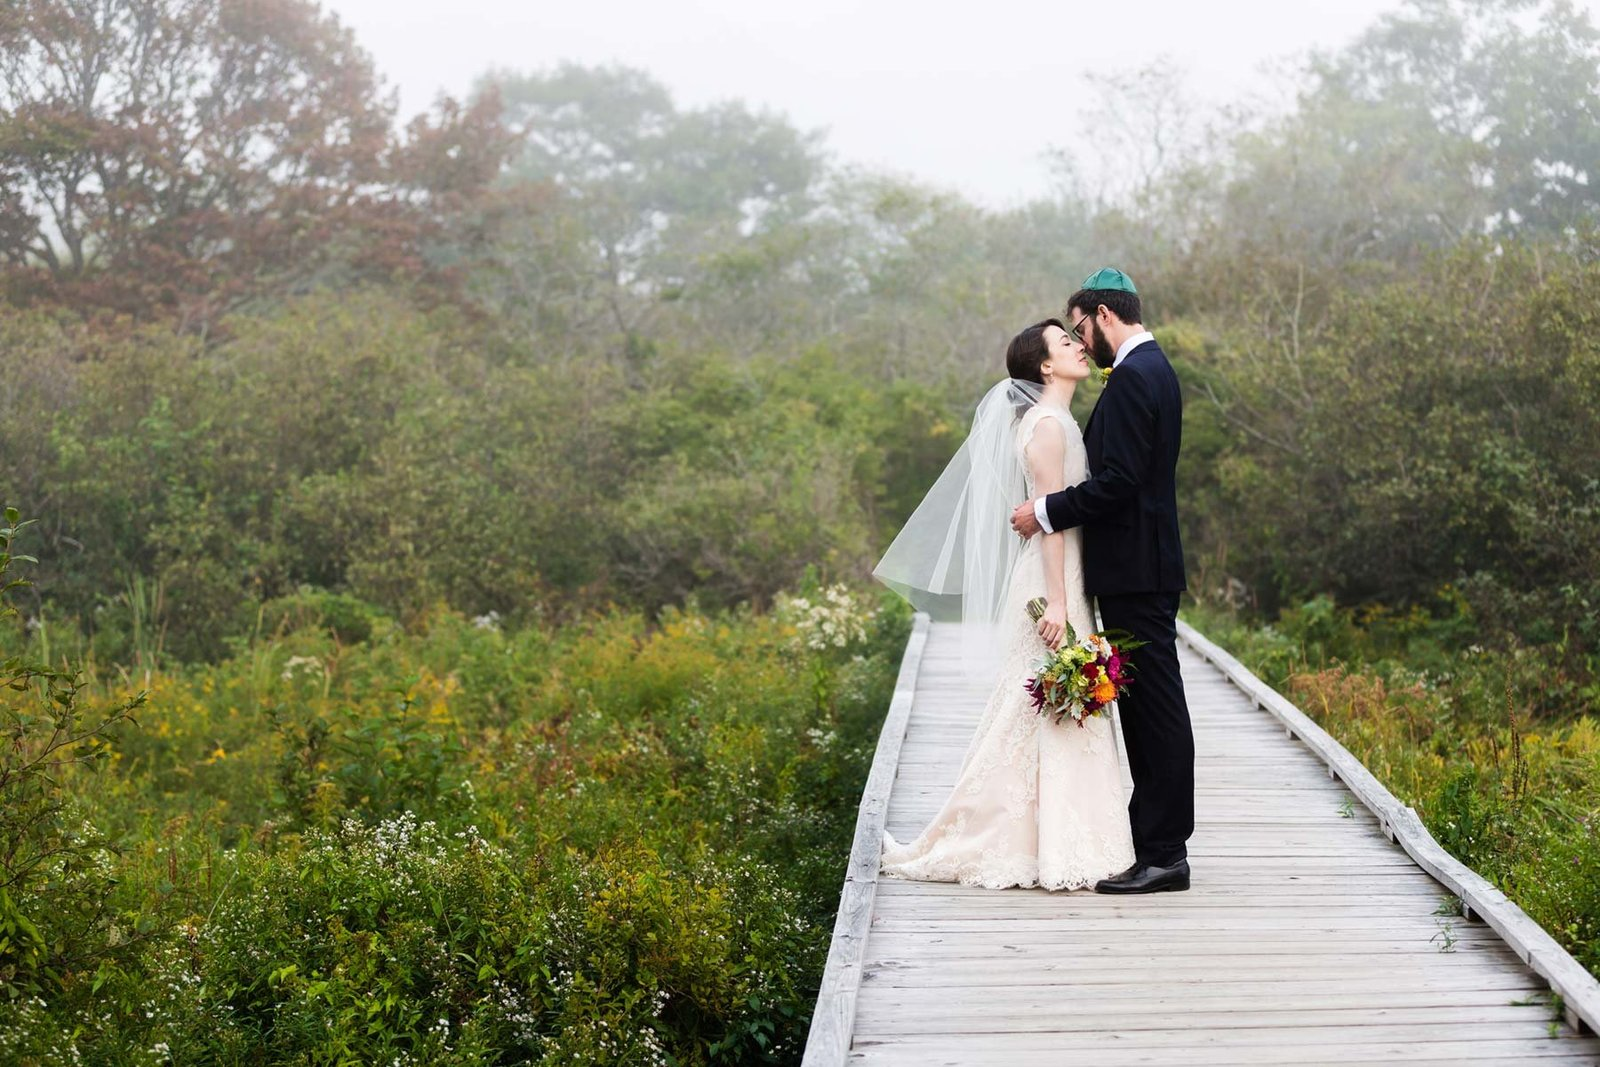 kettle cove southern maine cape elizabeth fog wedding image iamsarahv photography 182 sv2 7135 182sm jpg